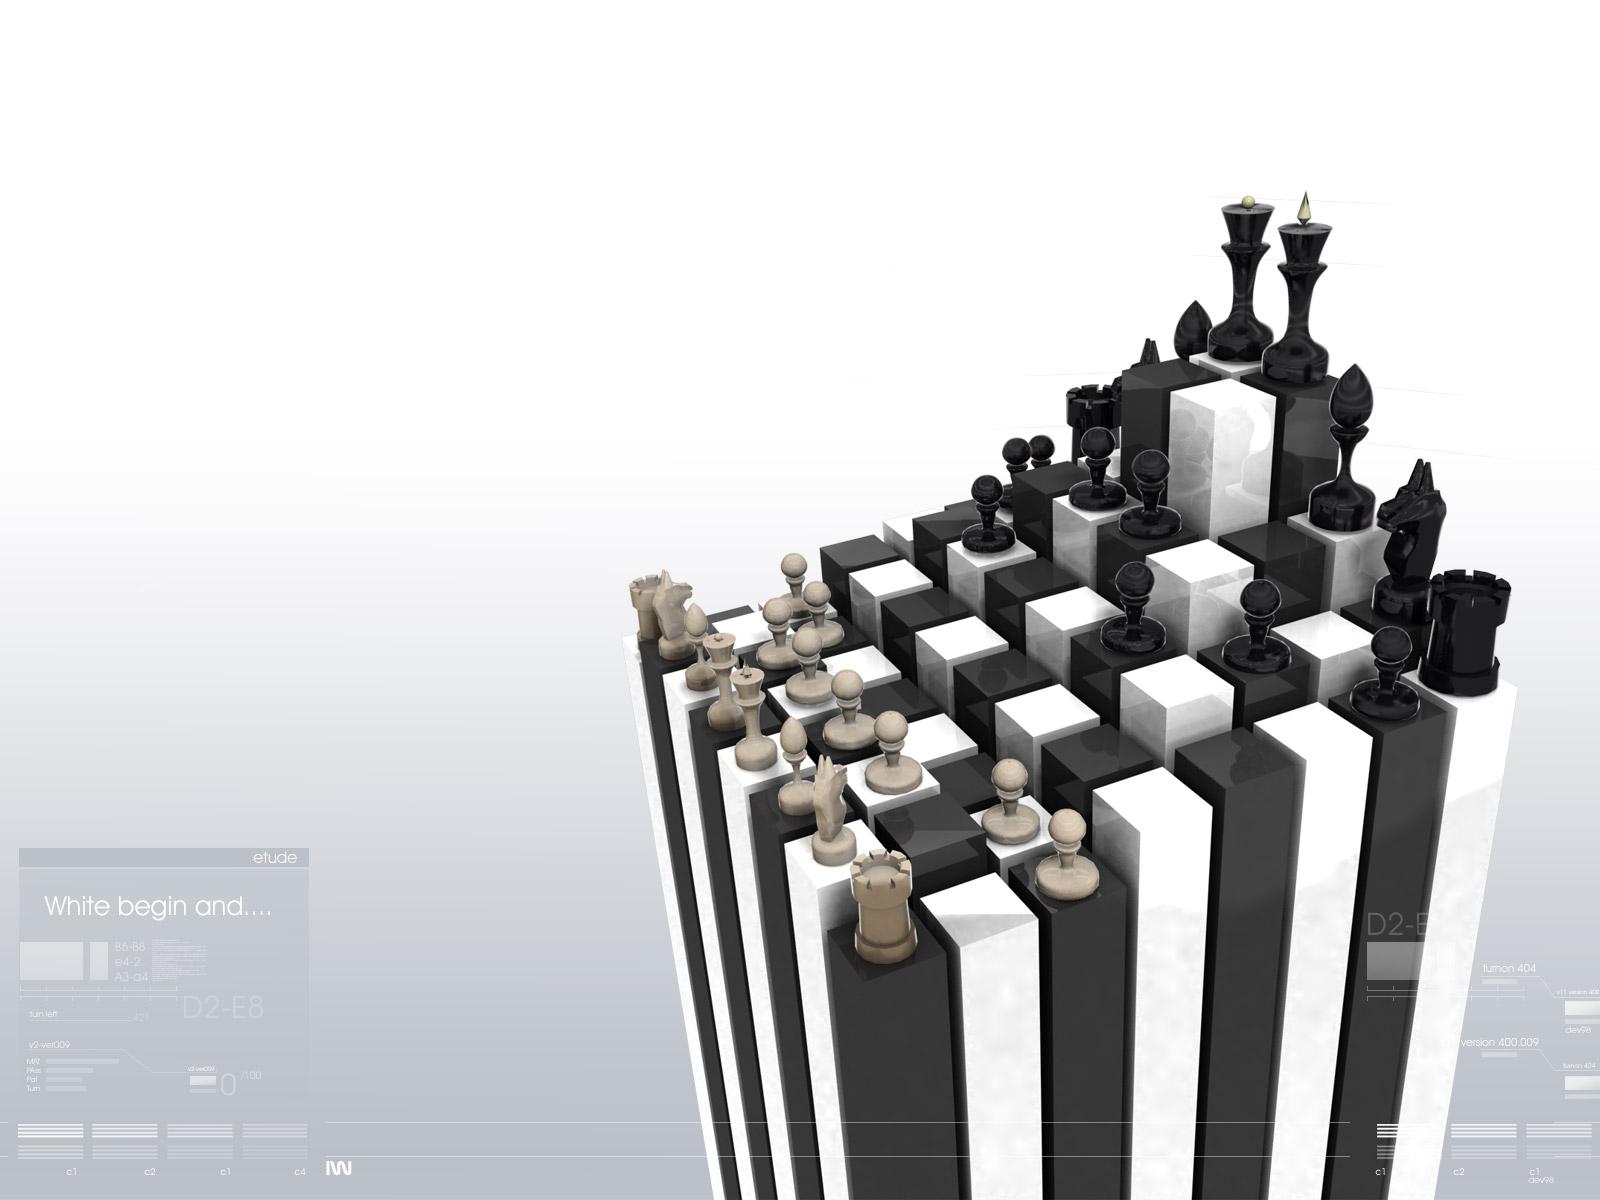 schach vs computer